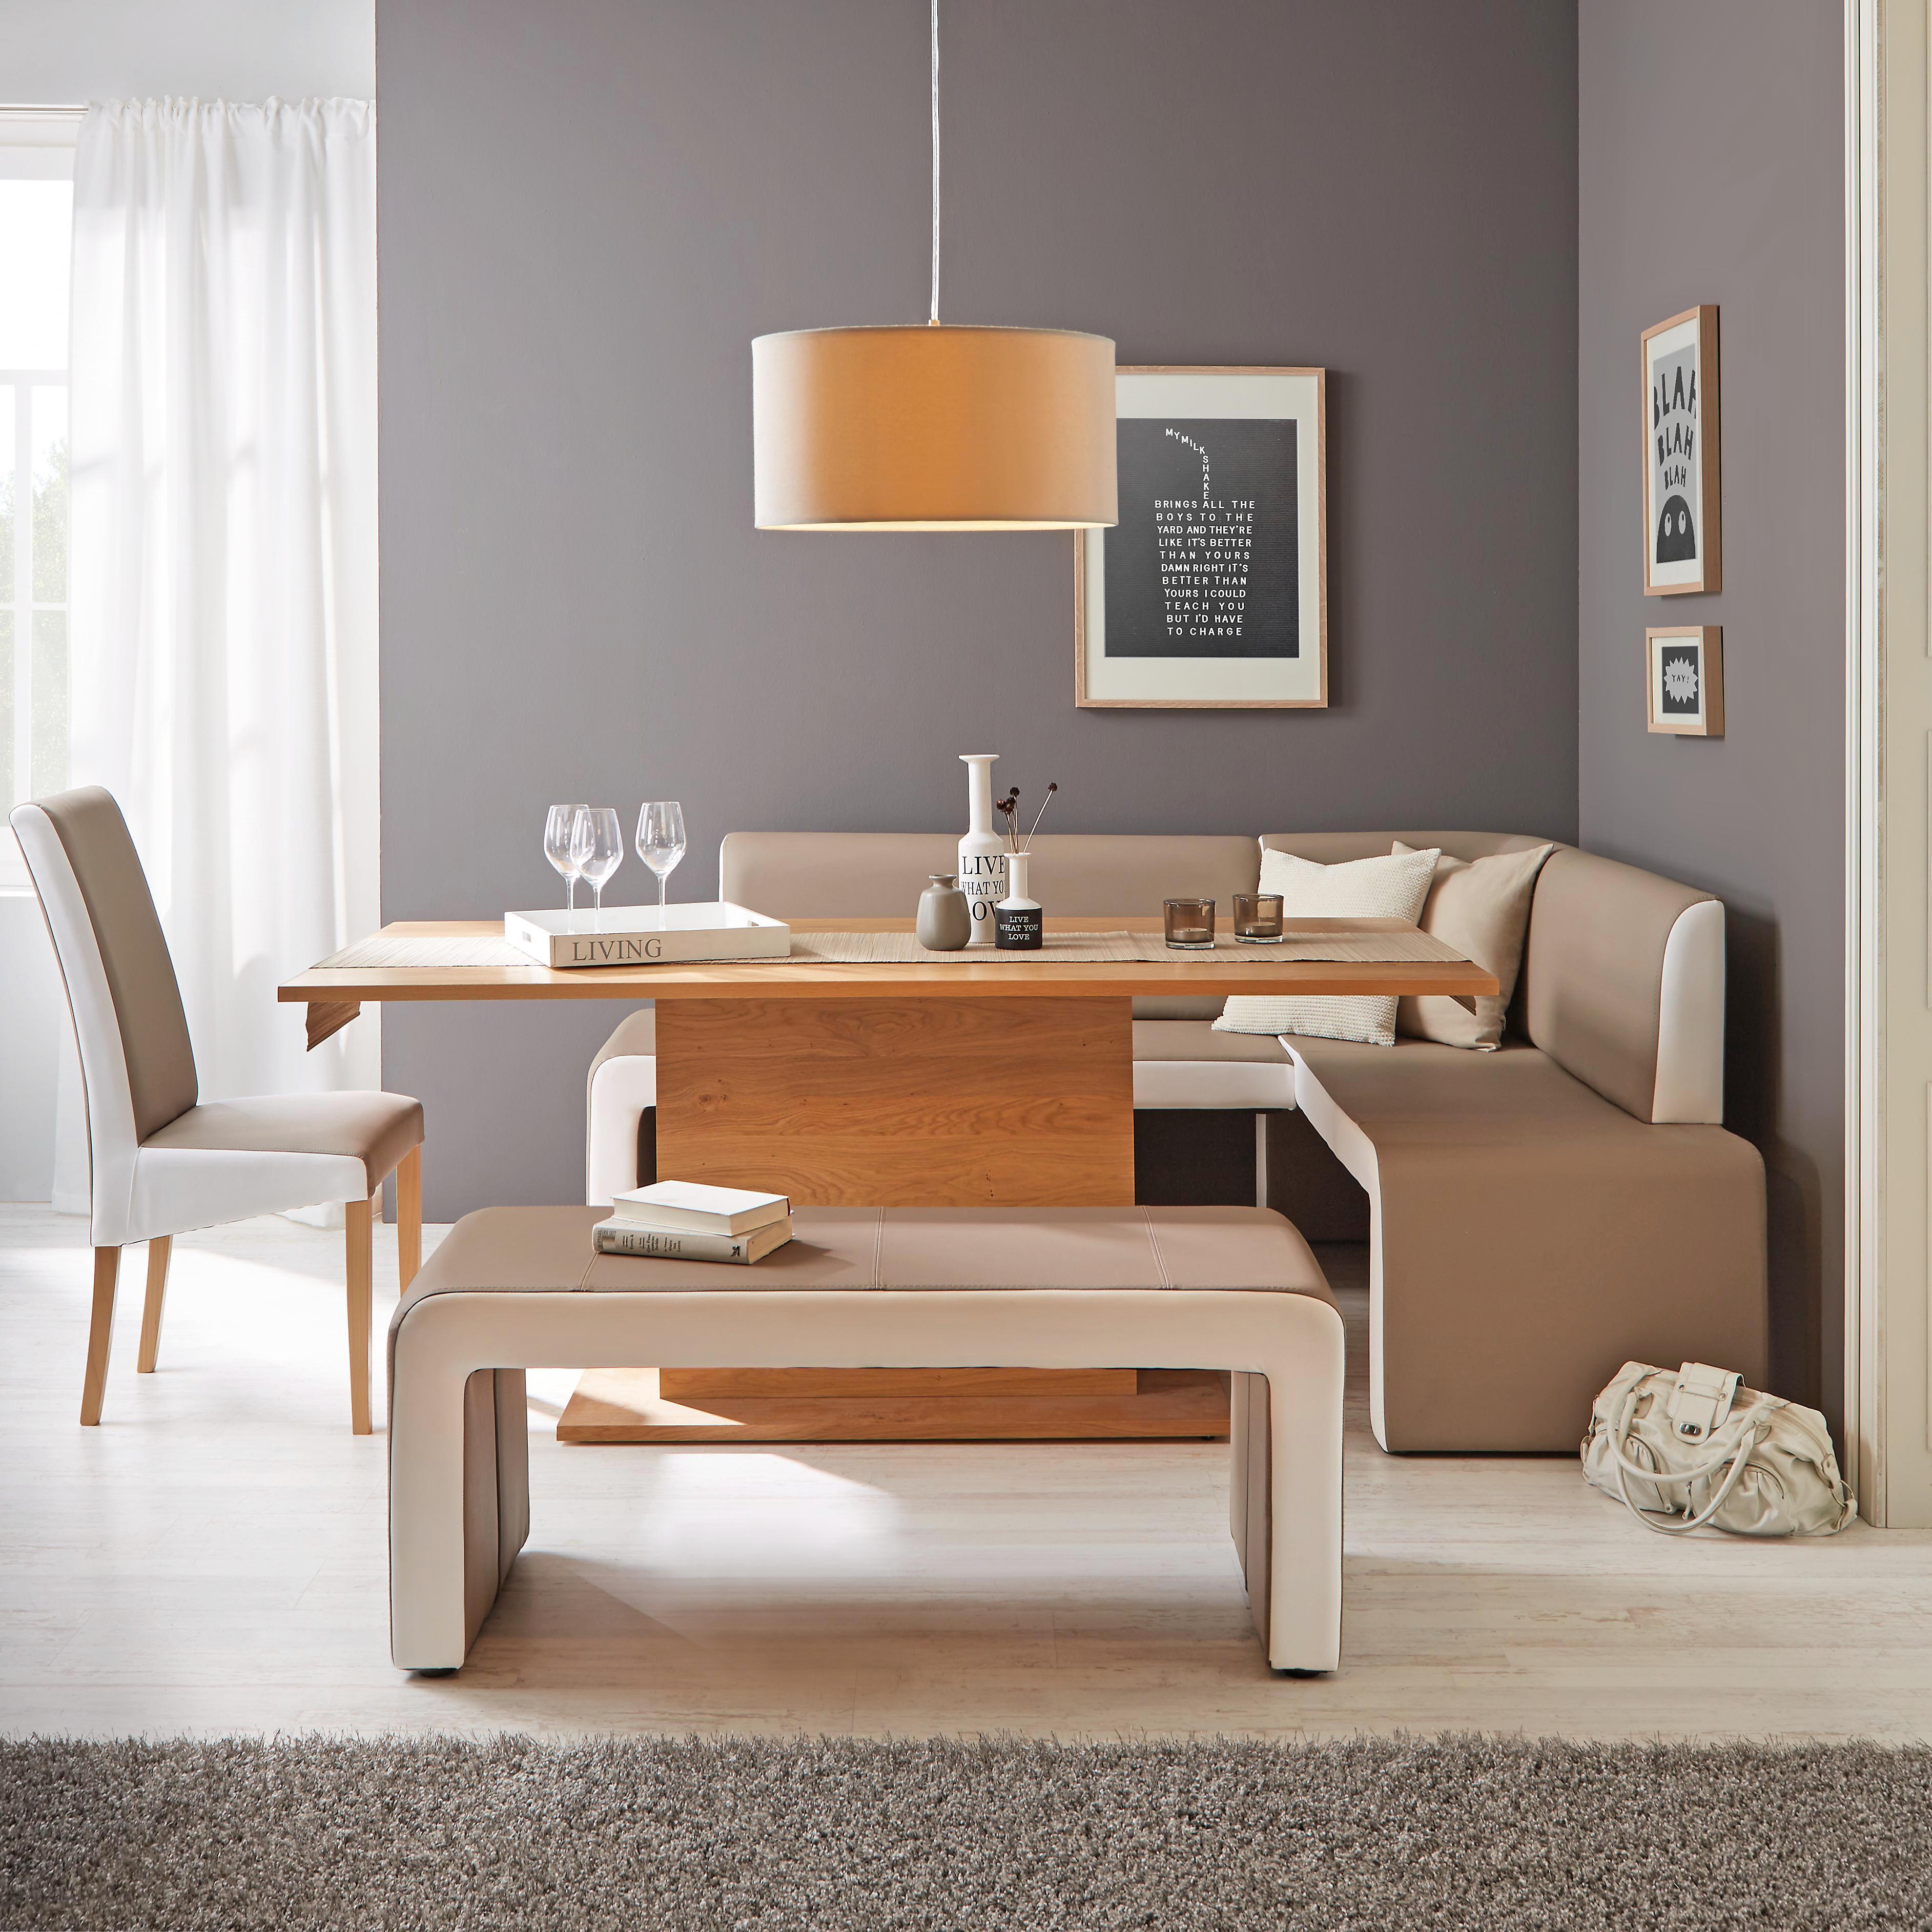 Beautiful Eckbank Küche Holz Gallery   House Design Ideas .